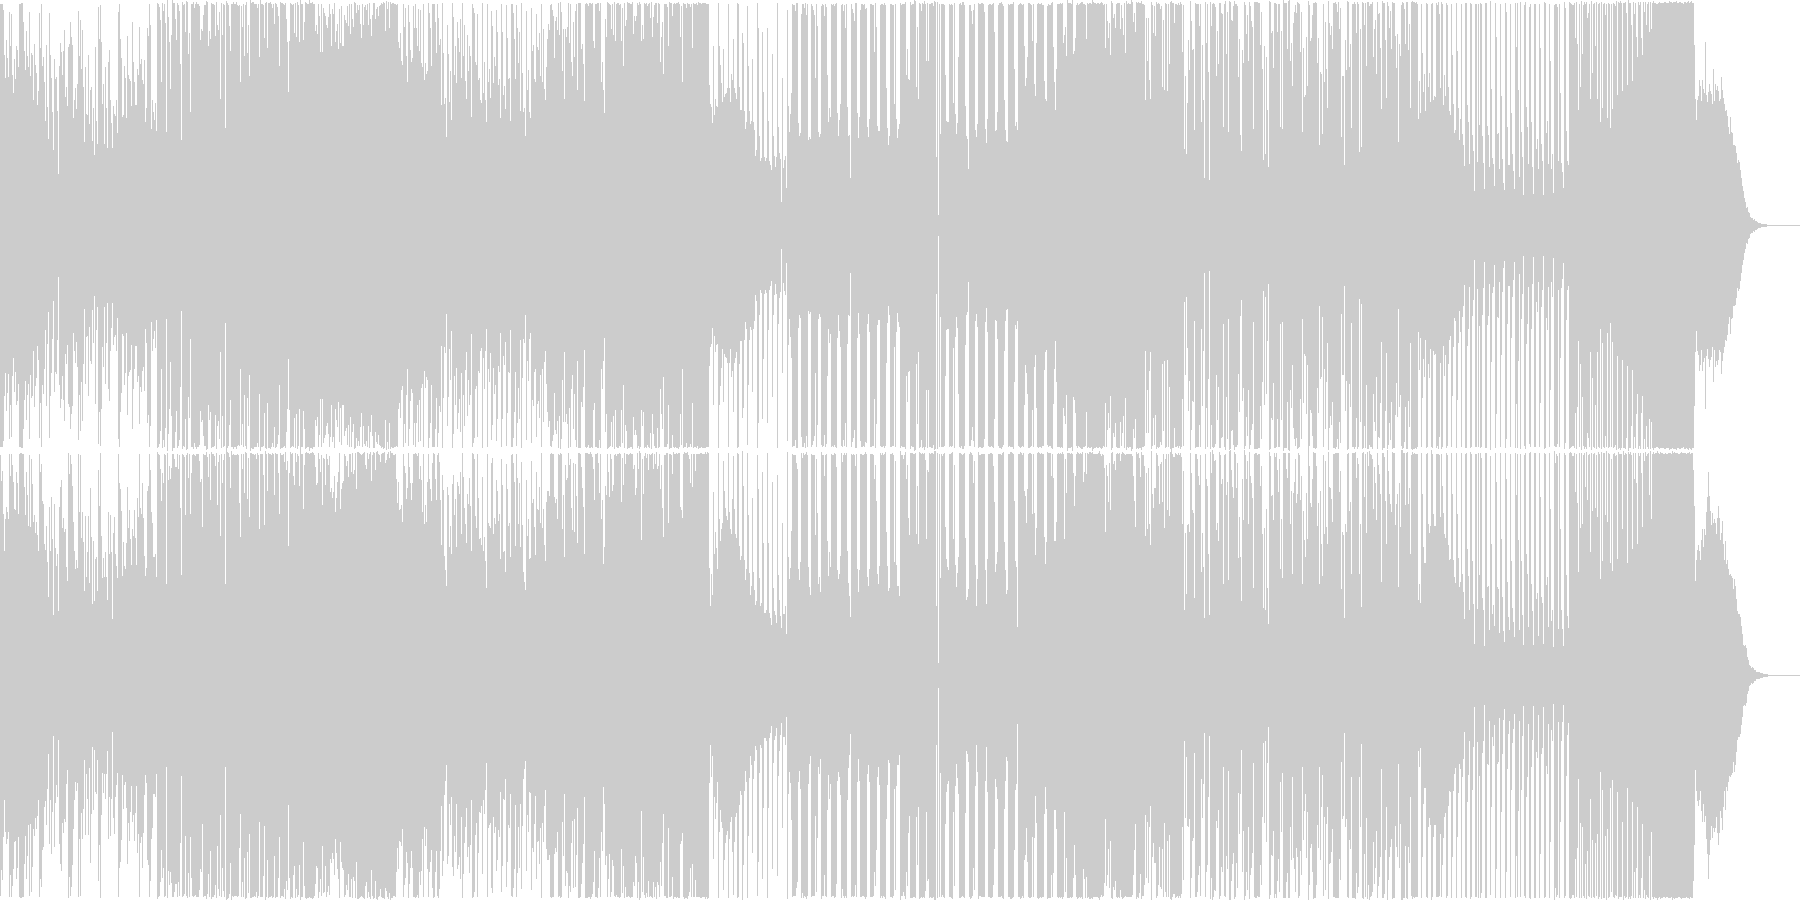 EDM MIX シリアス ニュース 混沌の未再生の波形